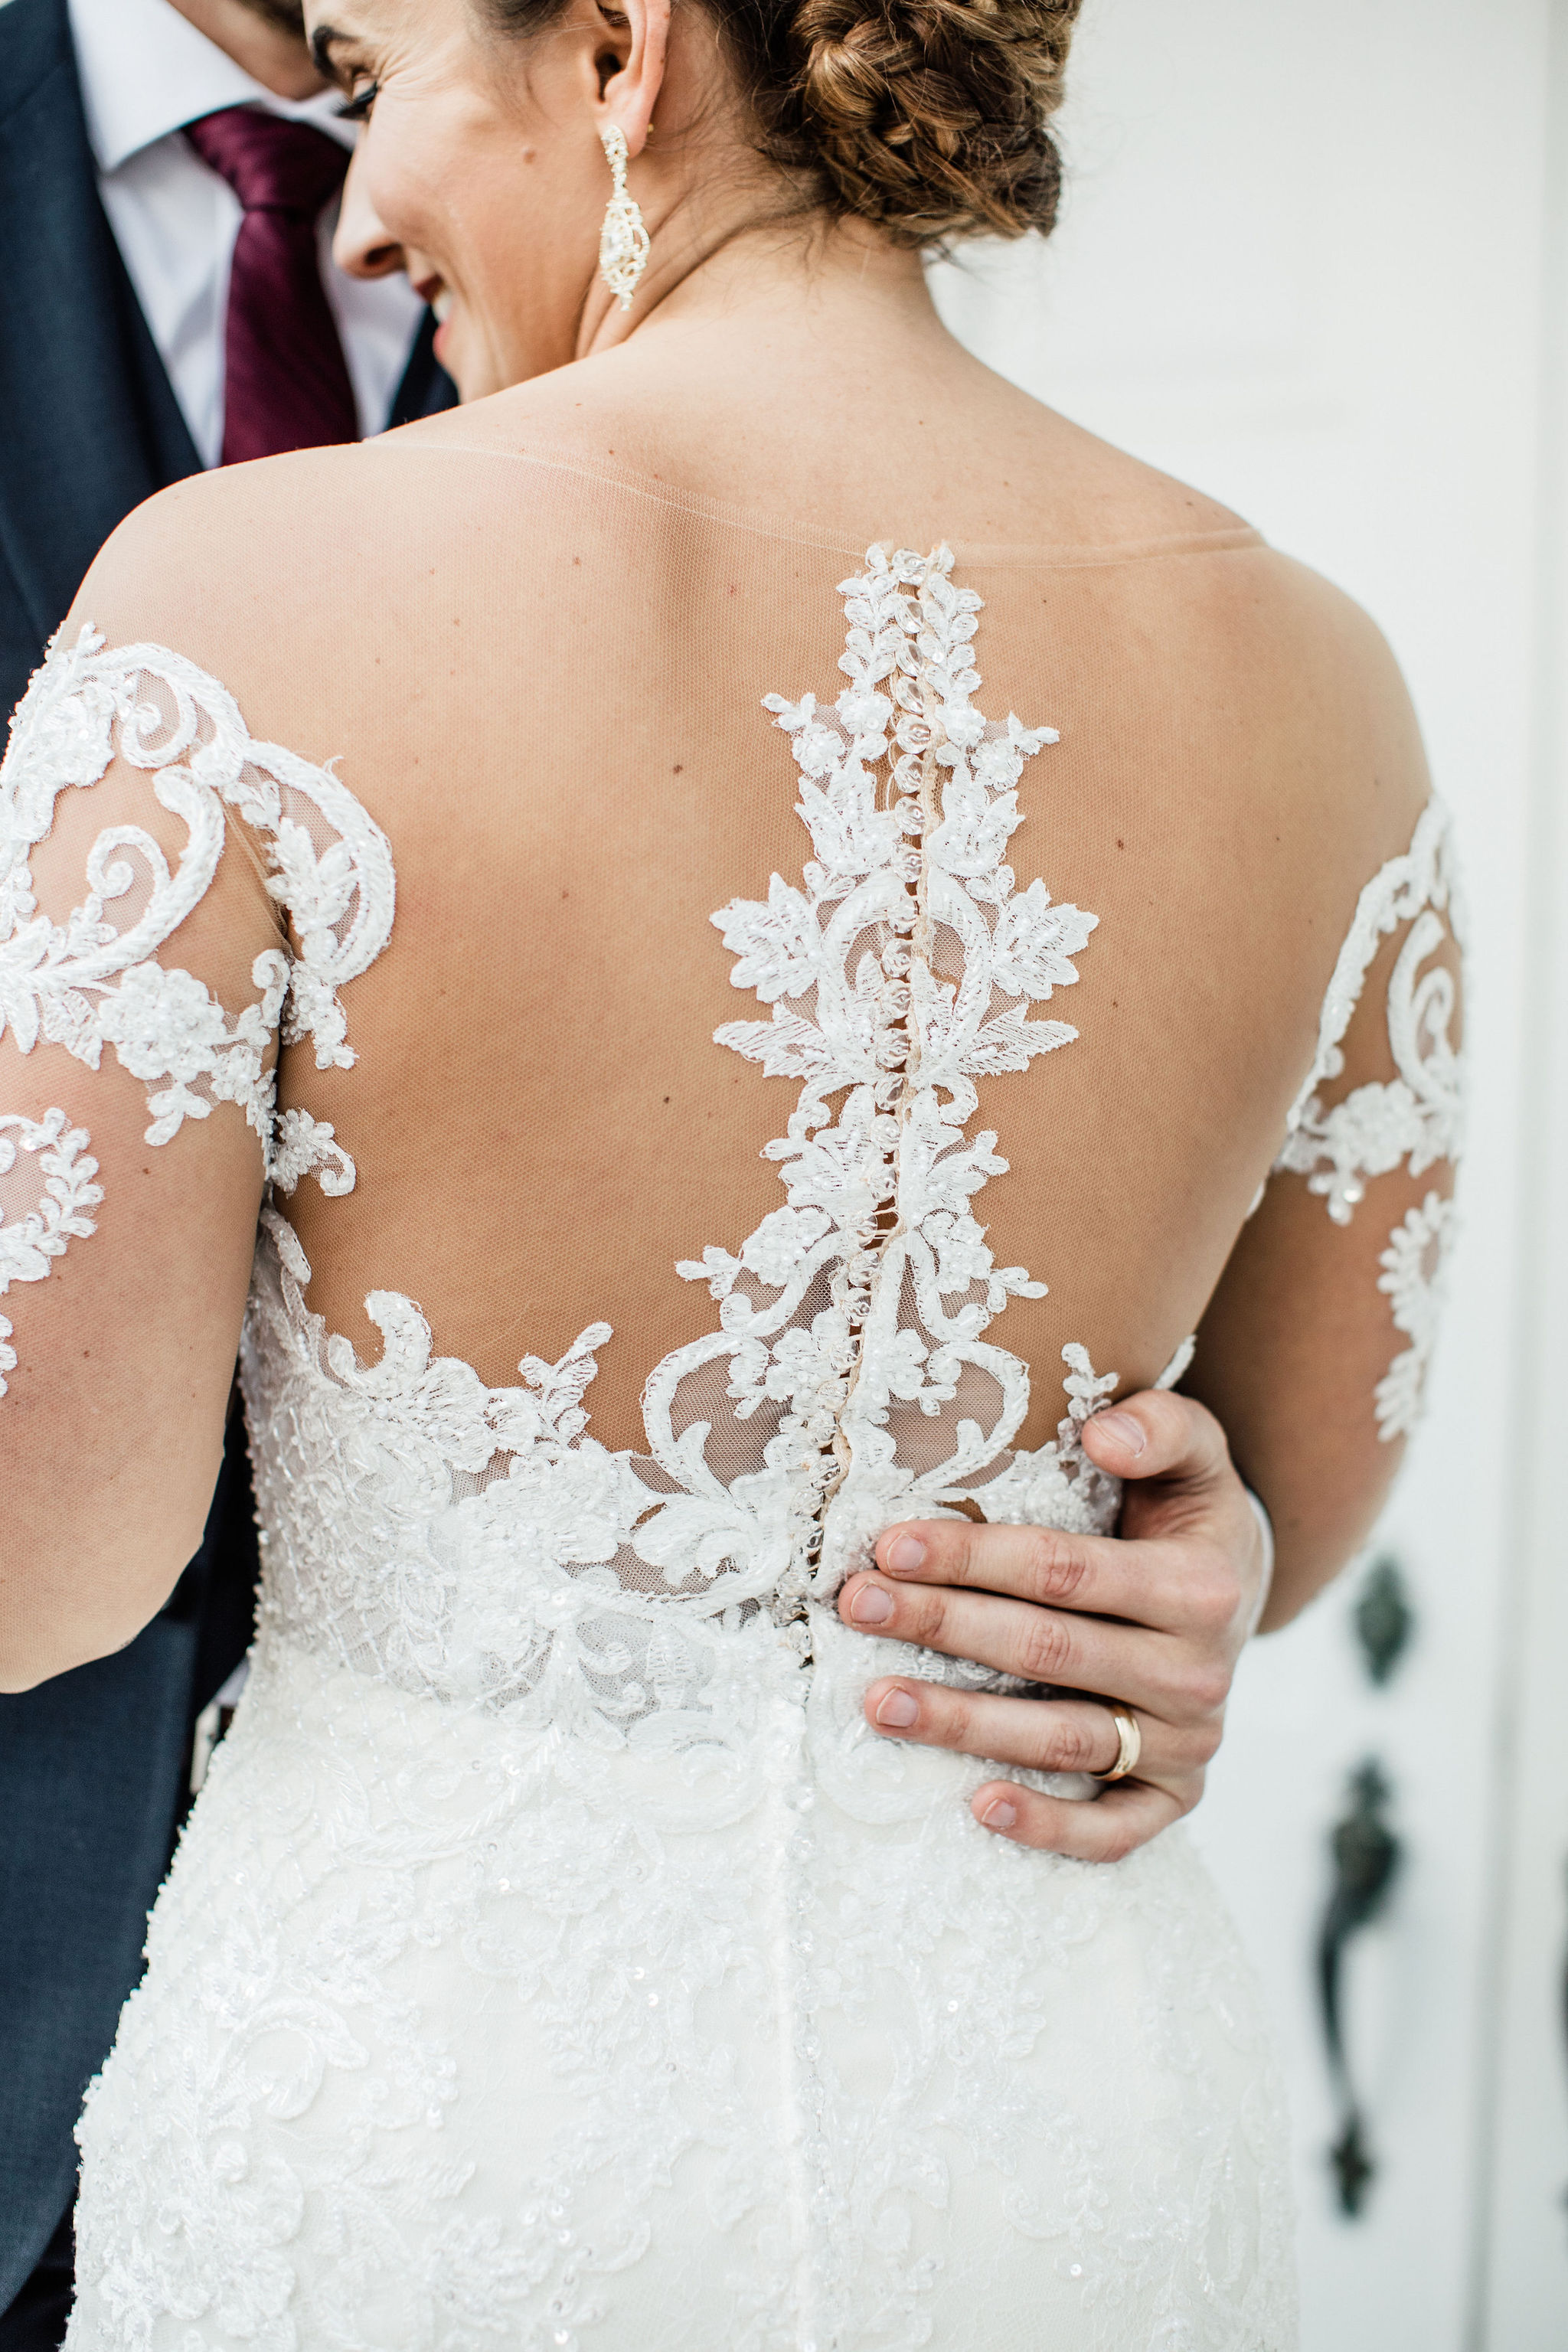 pensacola florida wedding gown.jpg